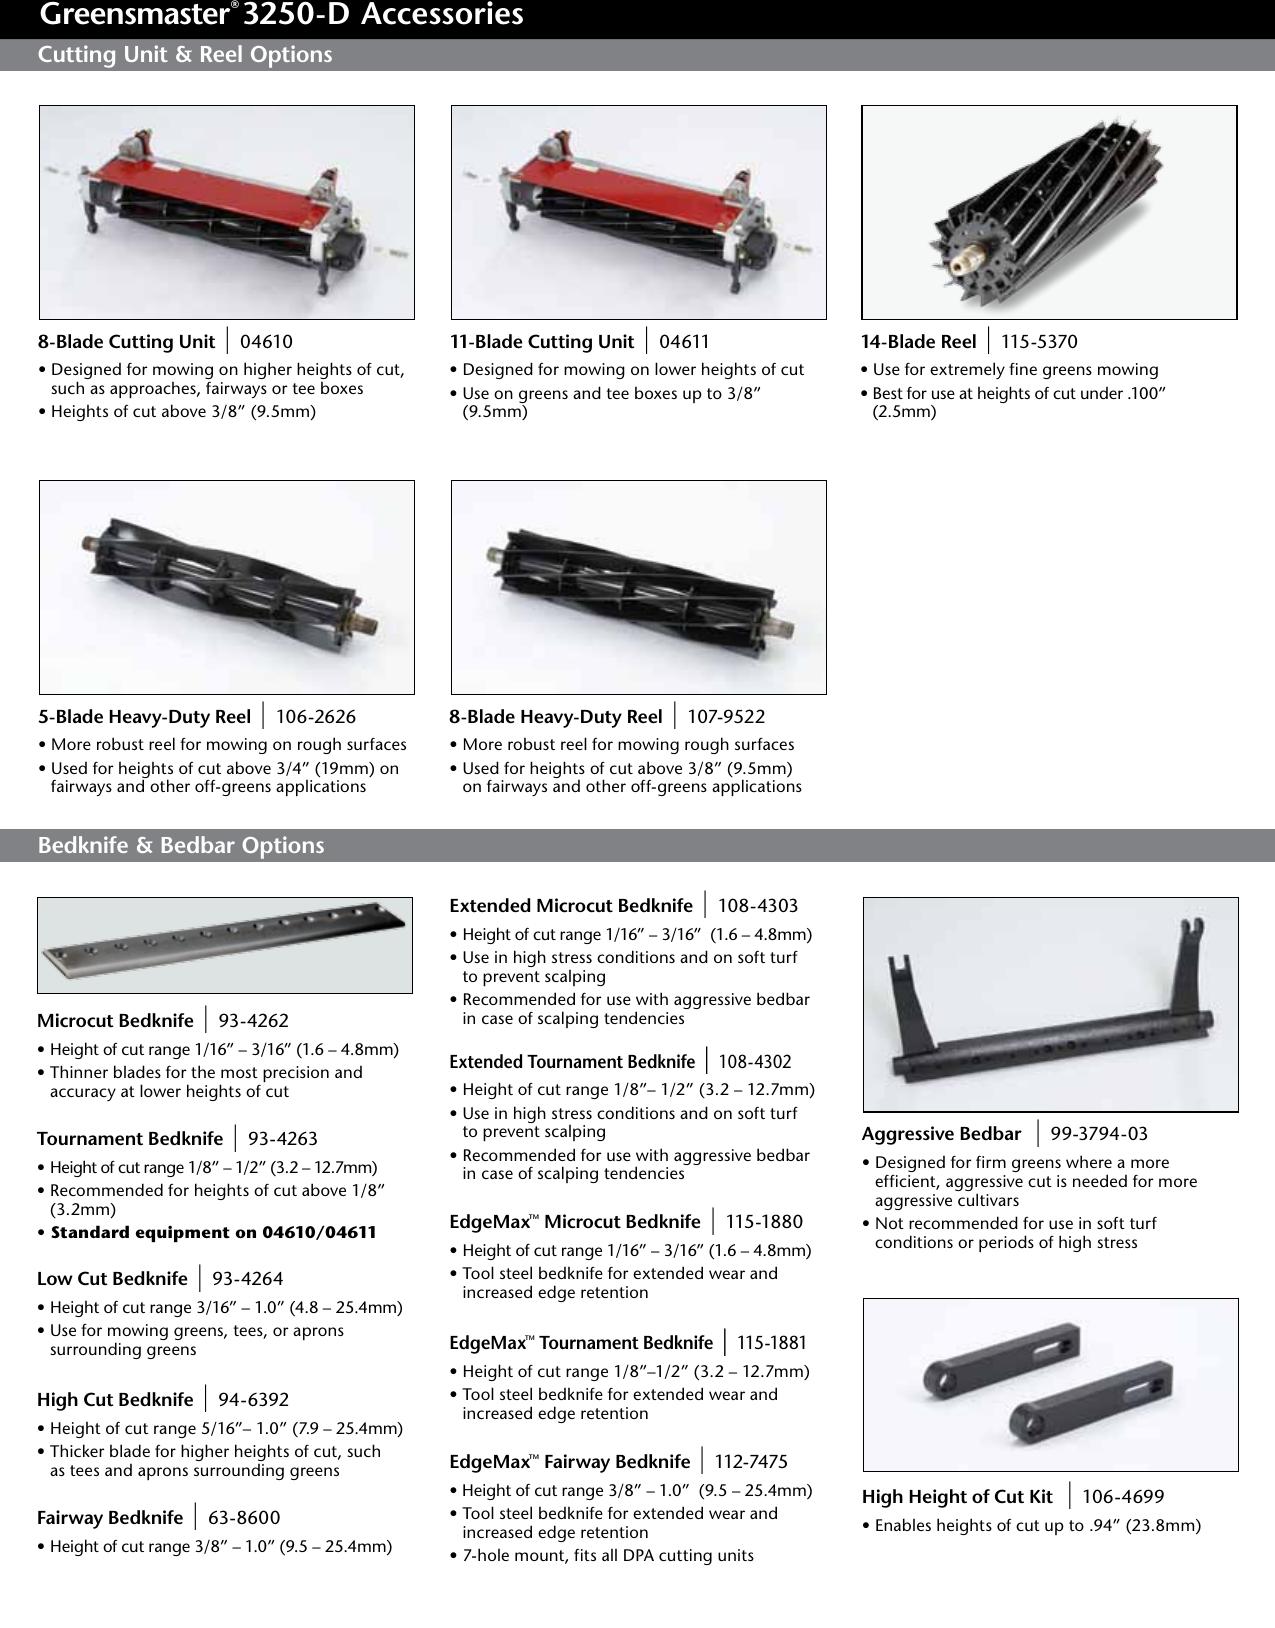 Toro Greensmaster 3250 D 04384 Accessory Guide